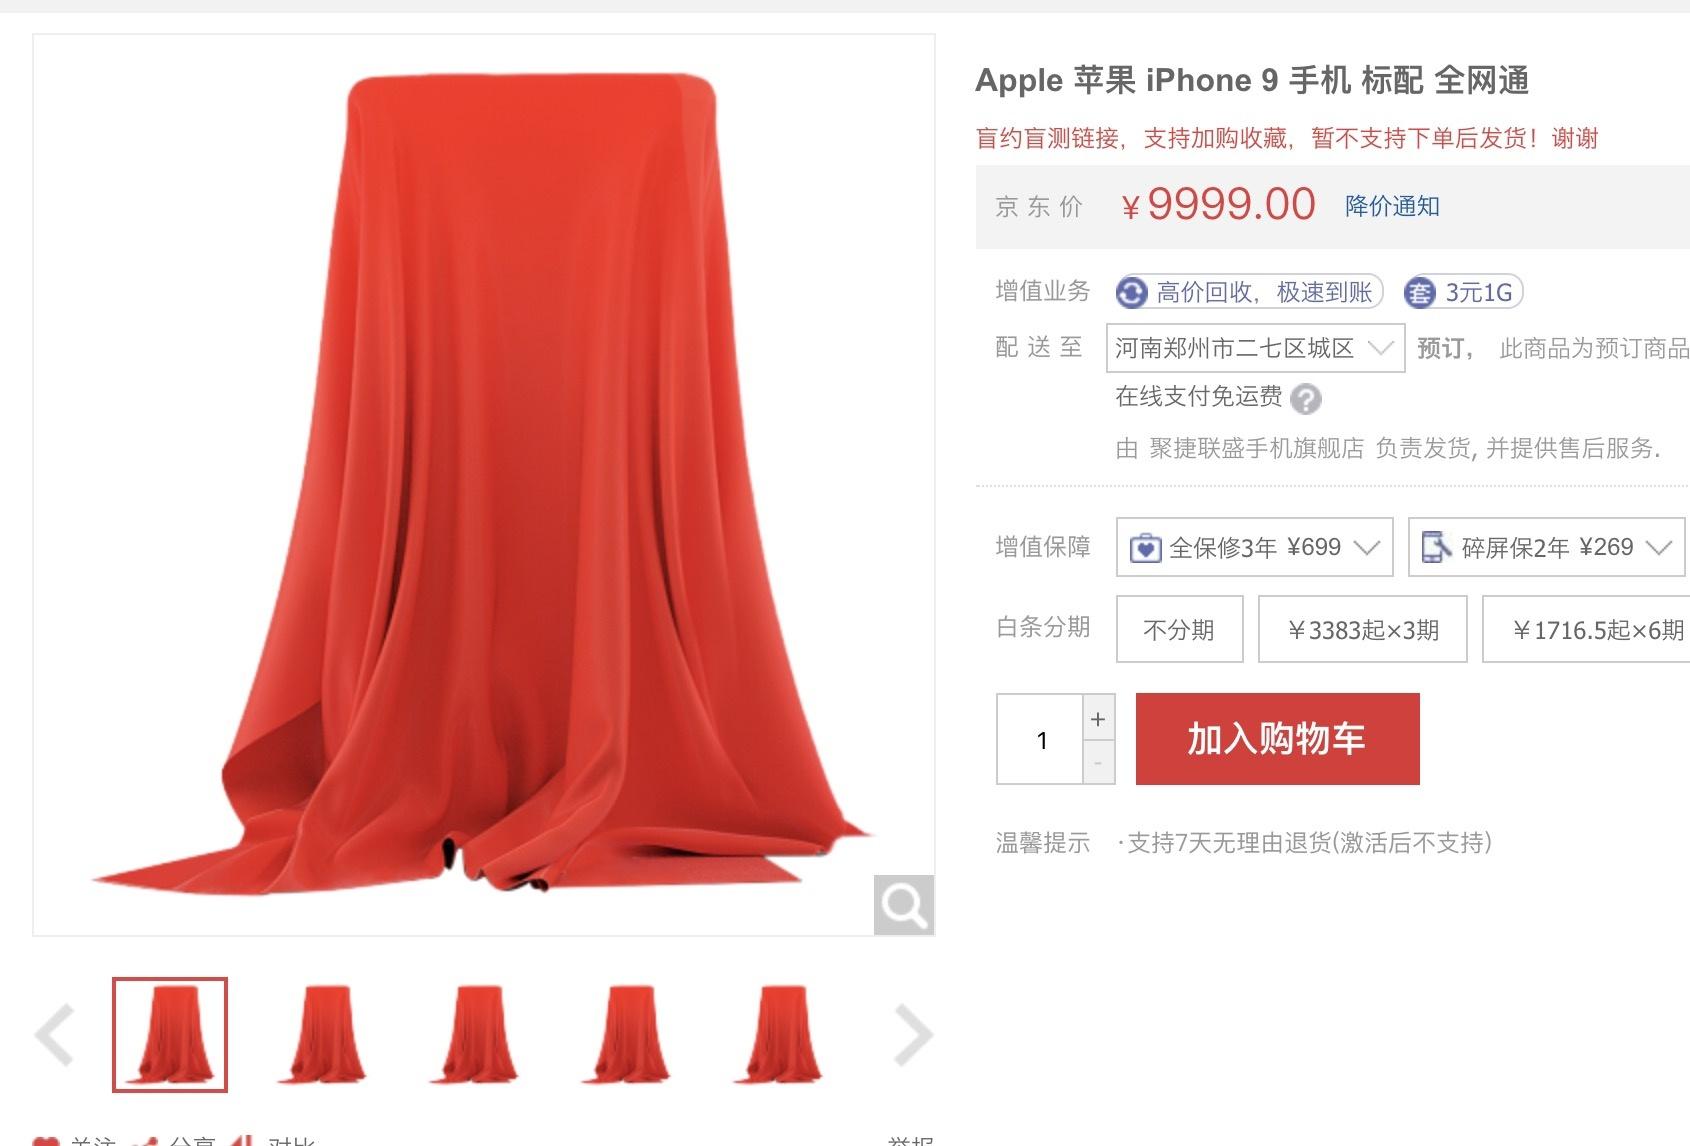 iPhone 9上架京东三方店 5月1日发货